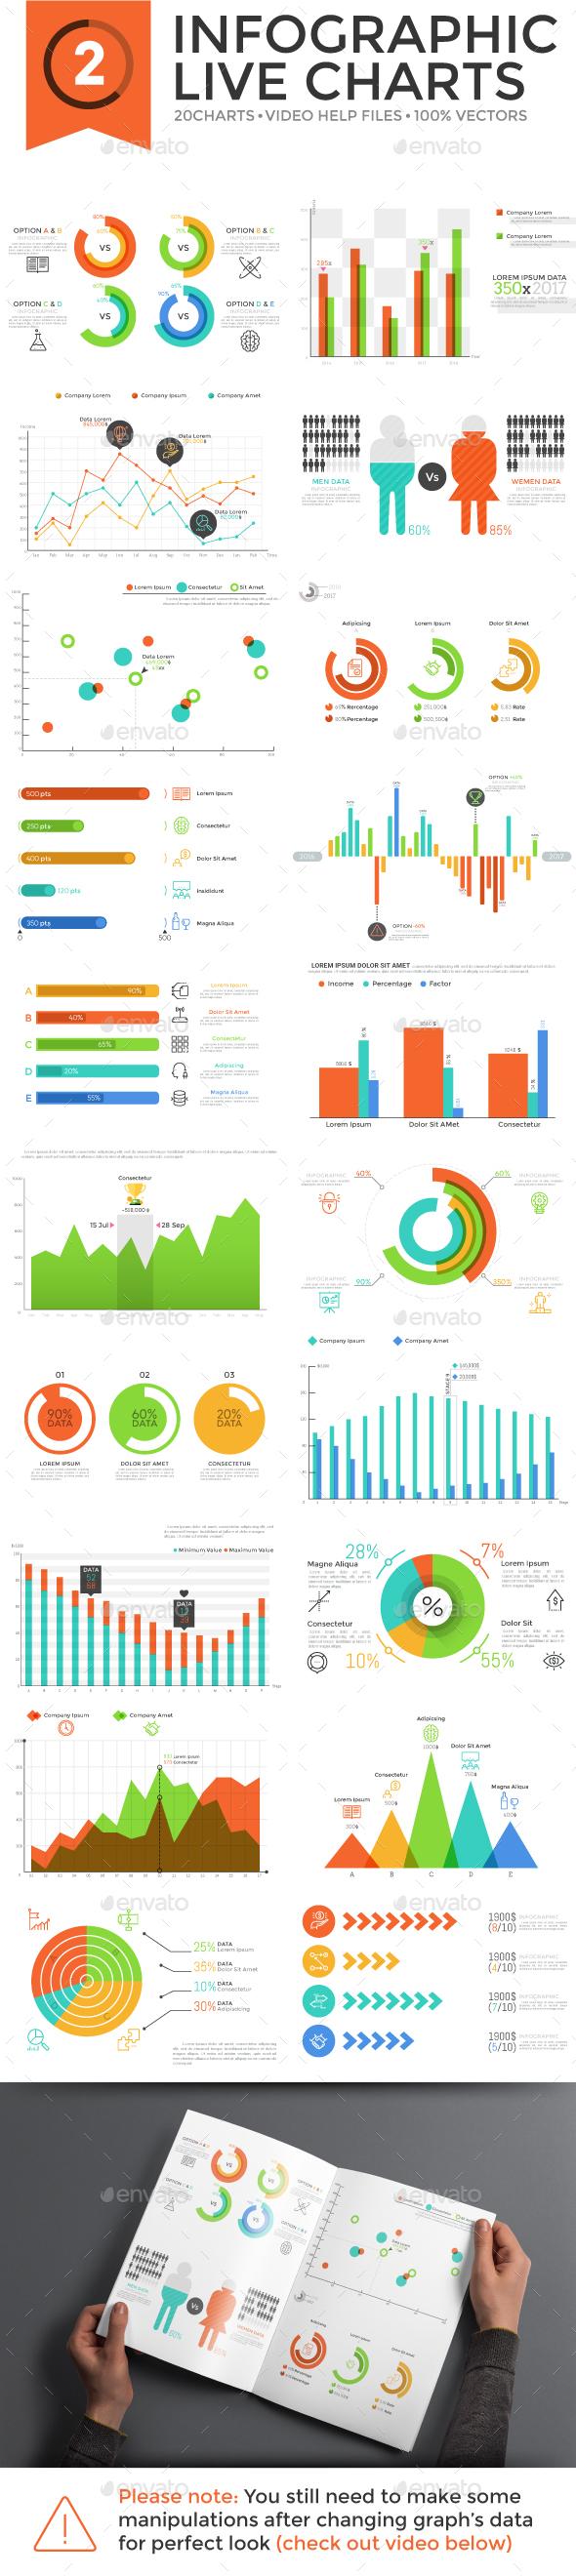 Edit Infographic Live Charts v.2 - Infographics